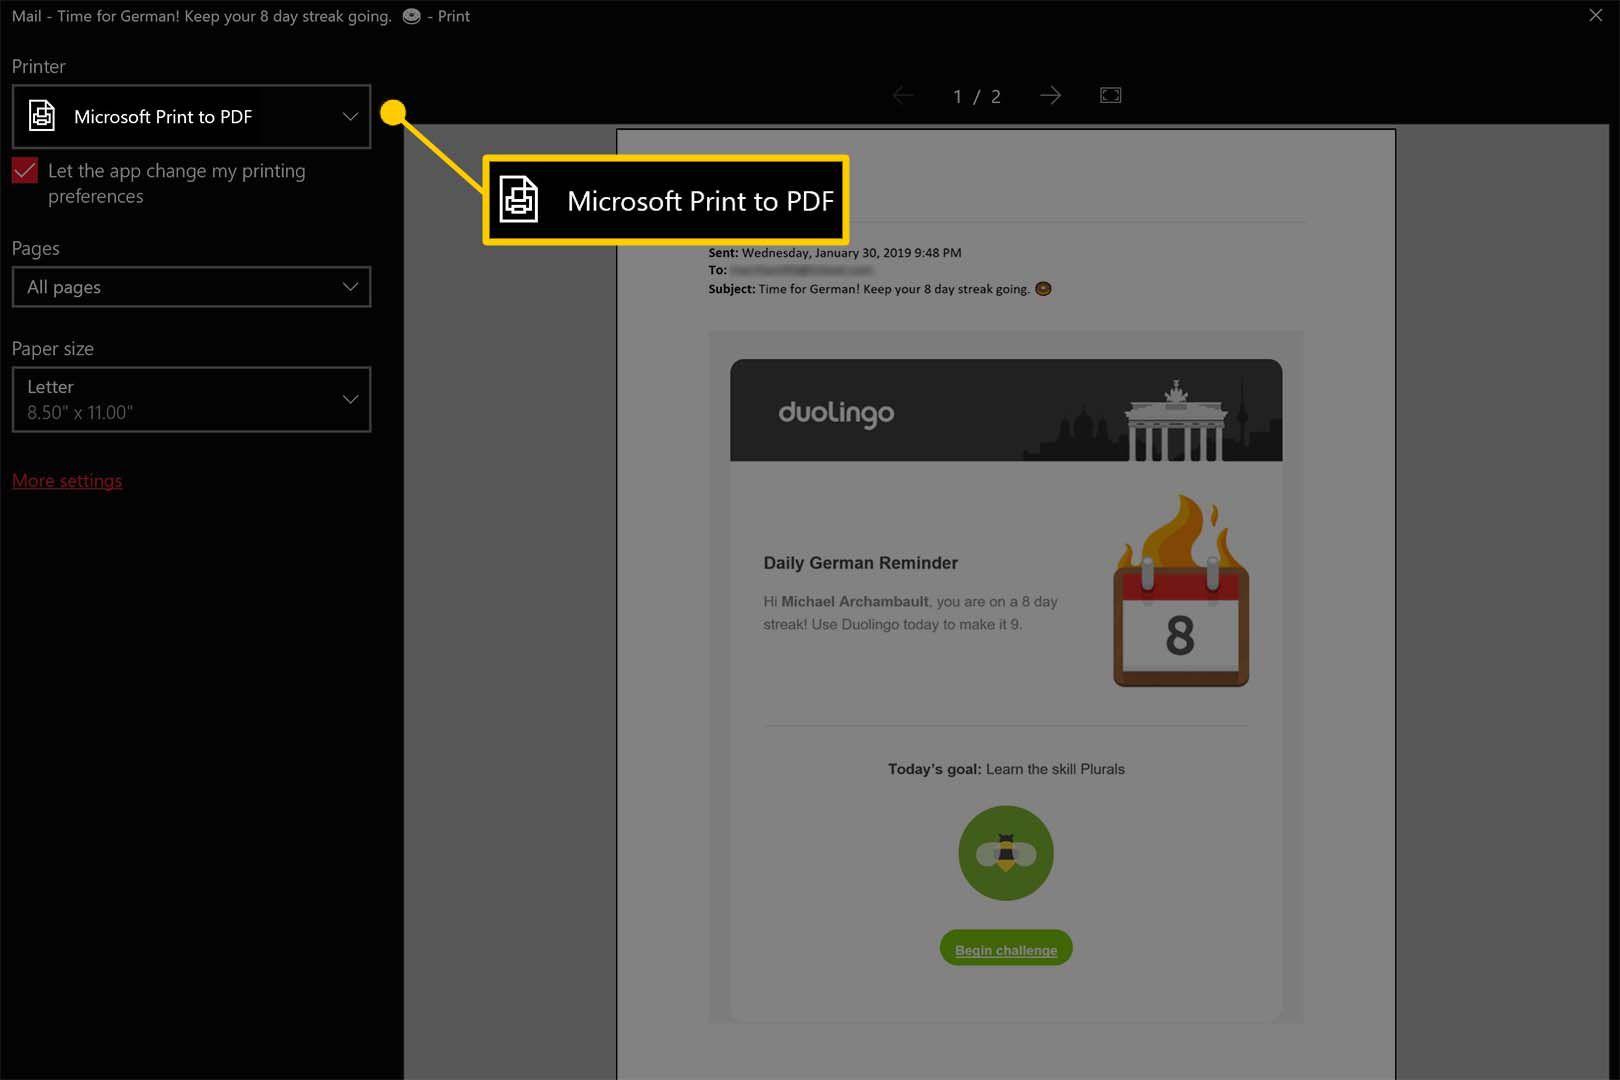 Print to PDF in Windows 10 / Windows 8